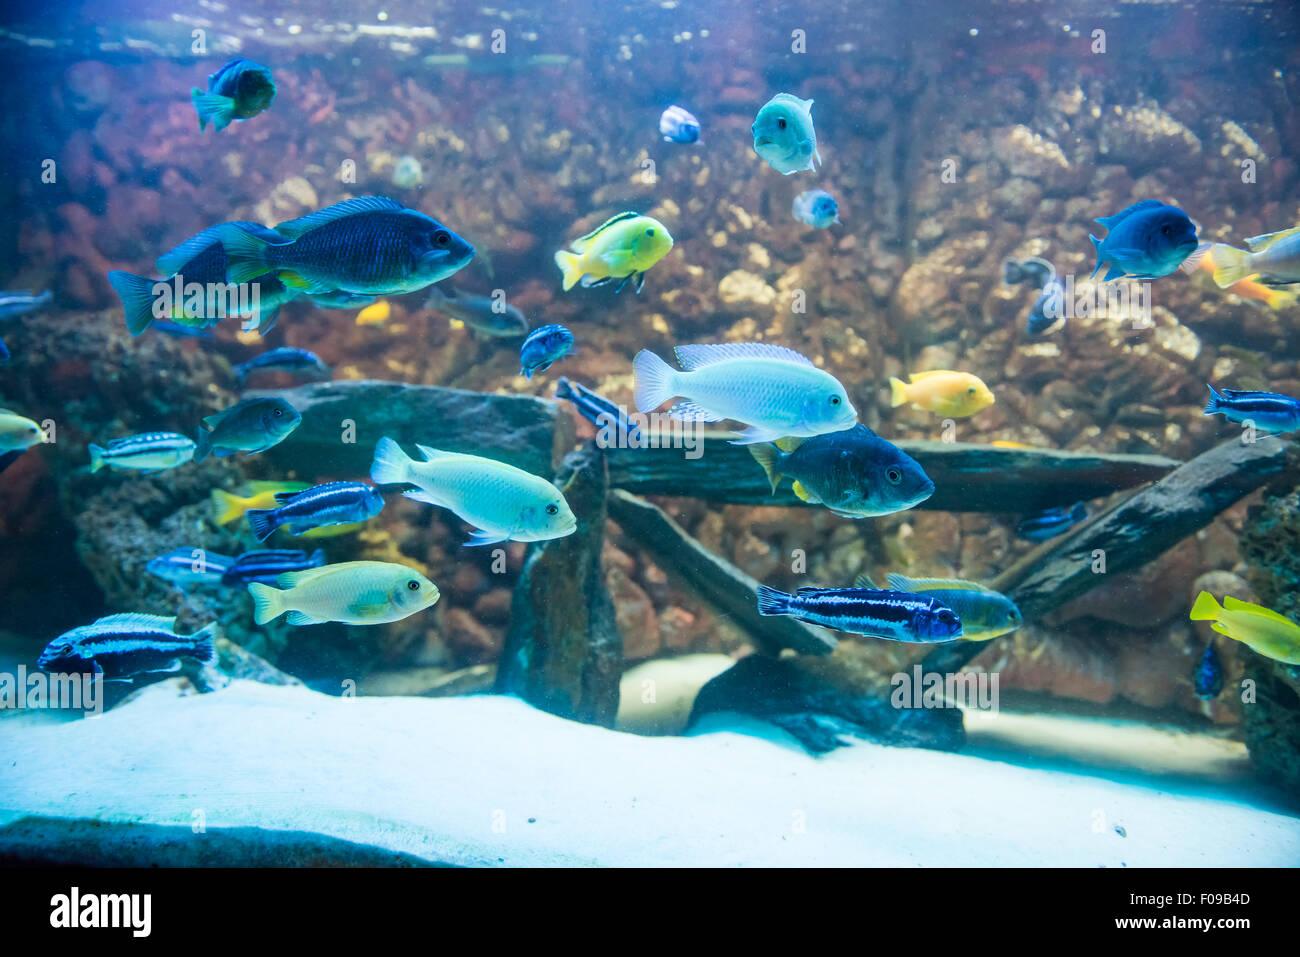 Freshwater Aquarium Fishes Stock Photos Freshwater Aquarium Fishes